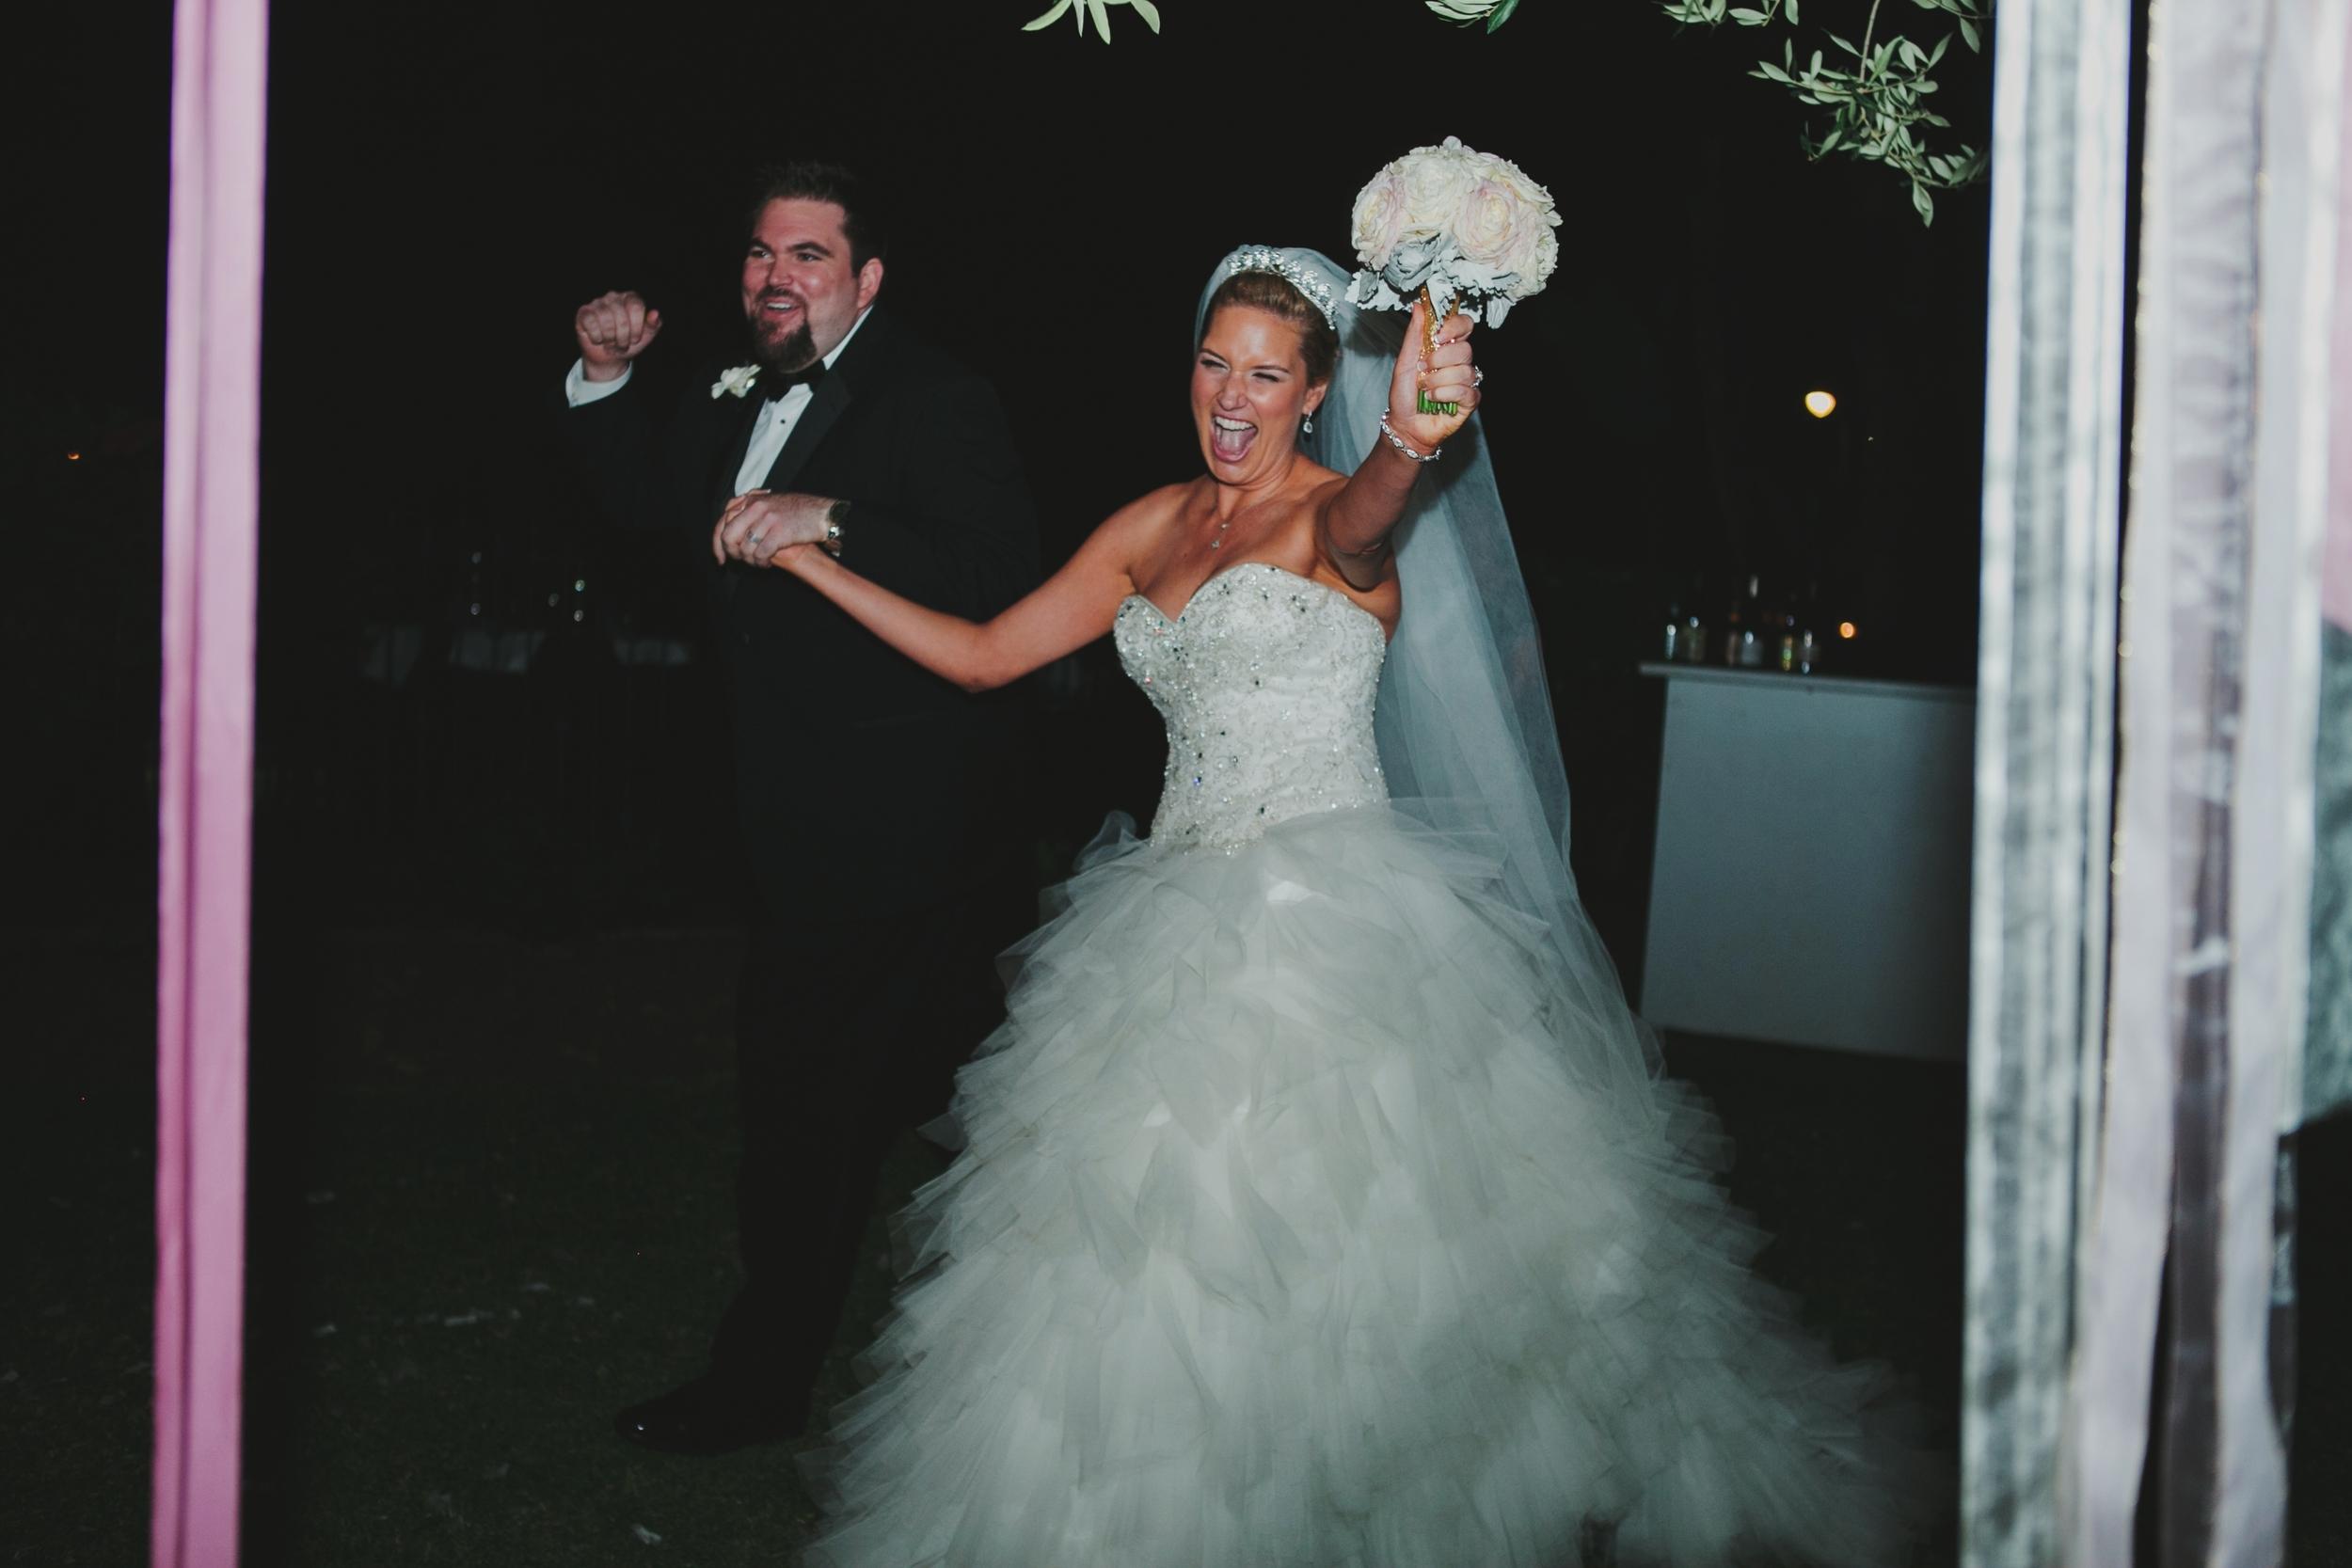 The-Suitcase-Studio-Timree-Matt-Lifestyle-Wedding-Photographer-088.jpg